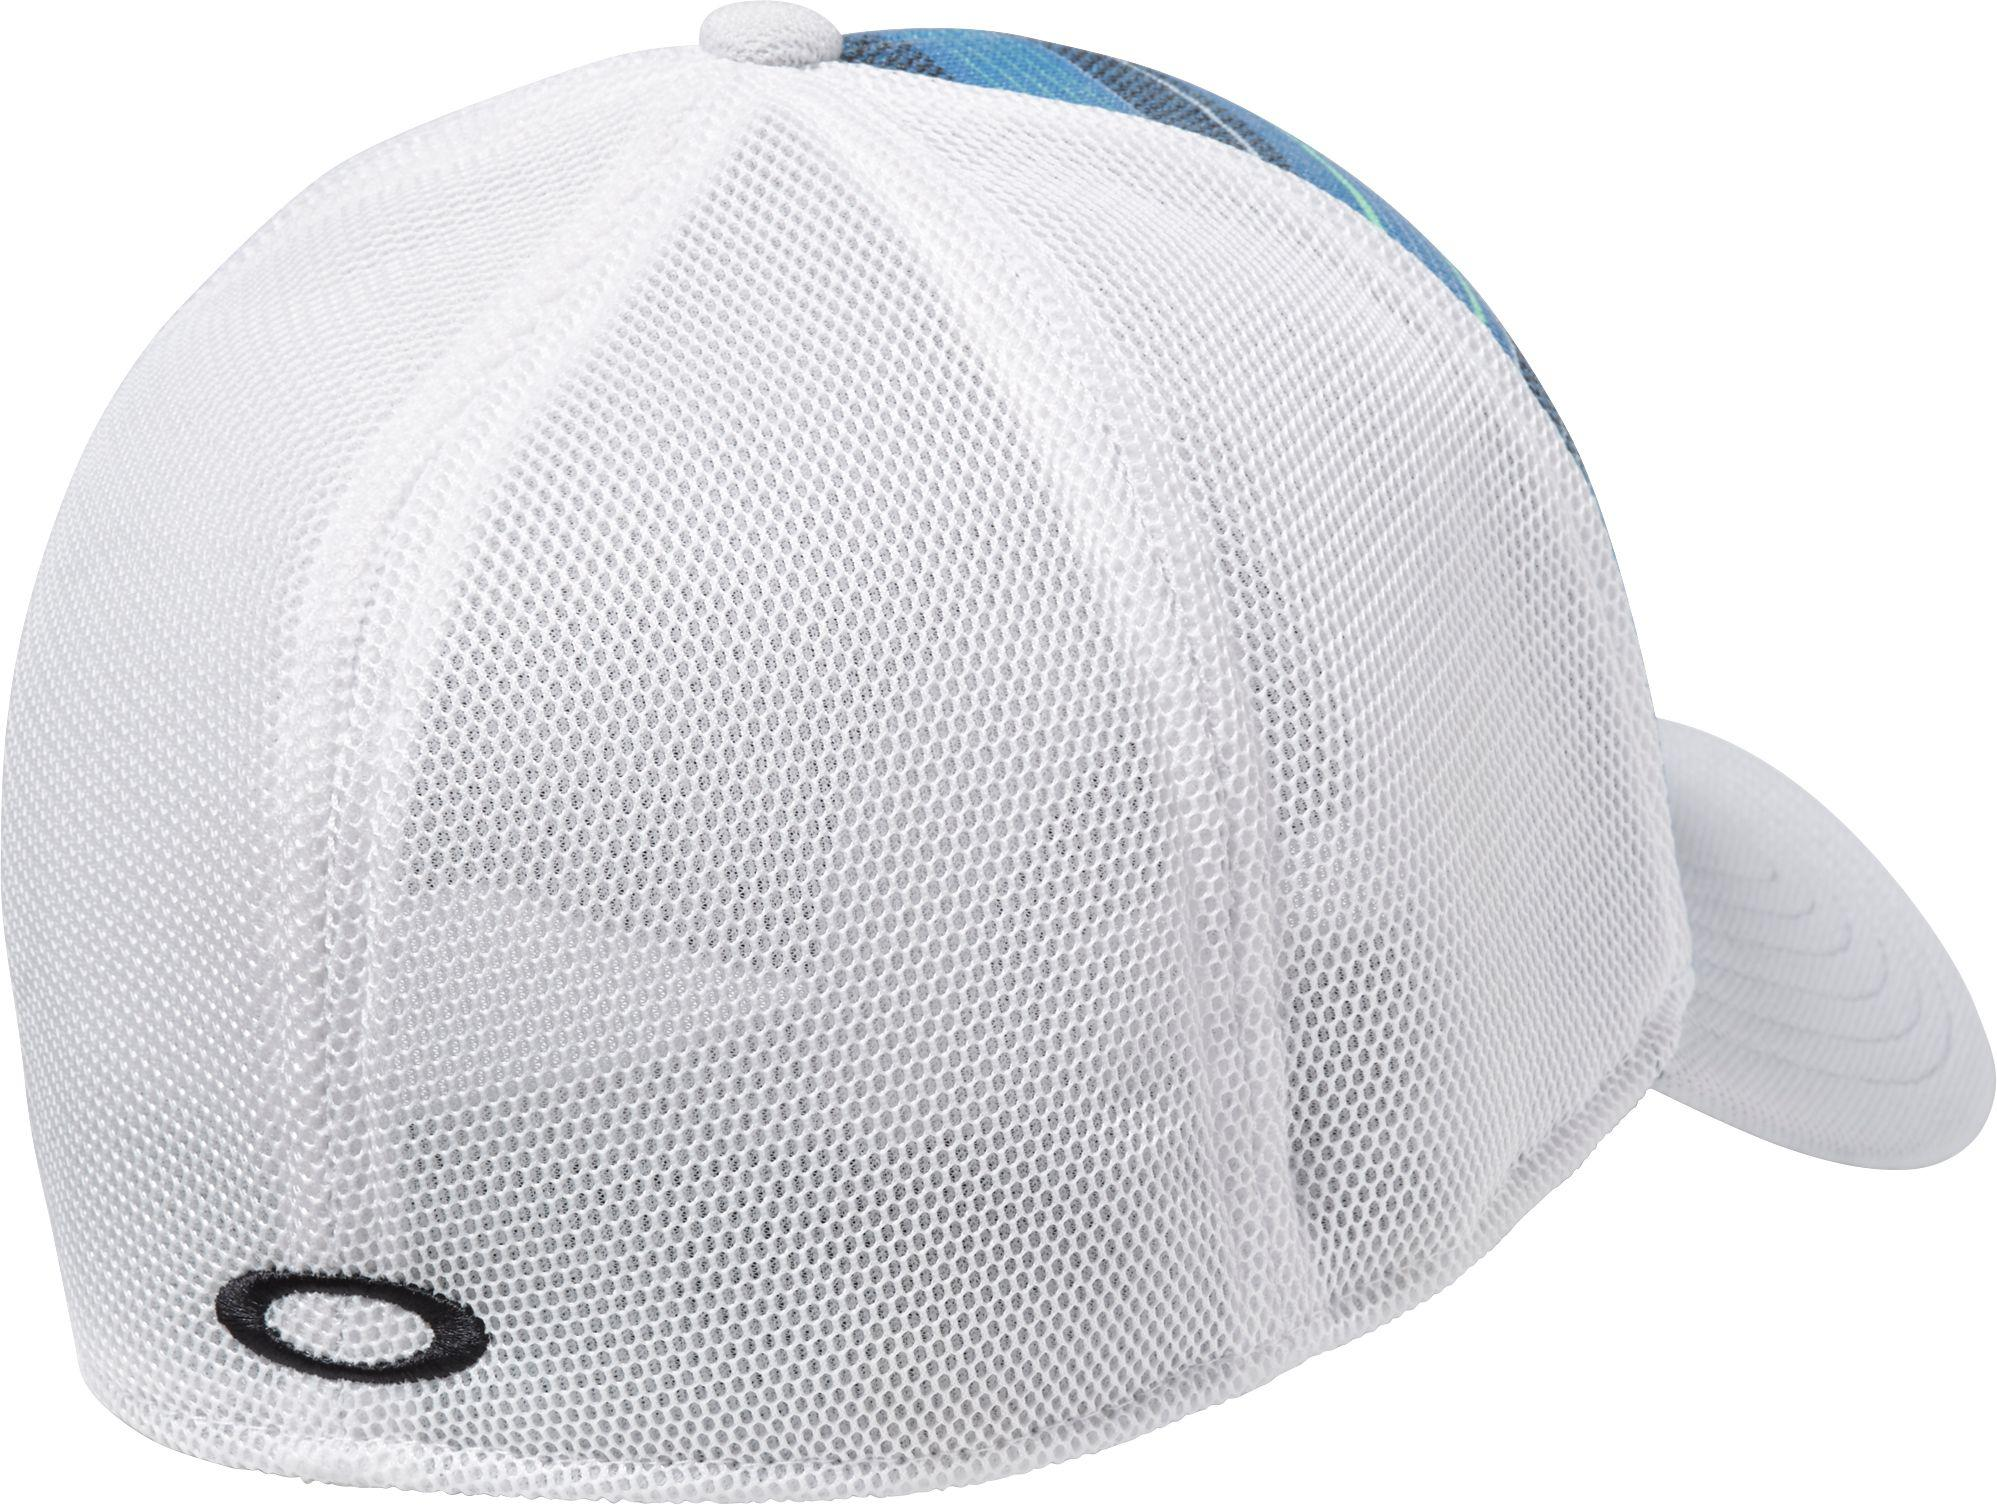 d4e63ec7613 Lyst - Oakley Silicon Bark Trucker 2.0 Print Golf Hat for Men